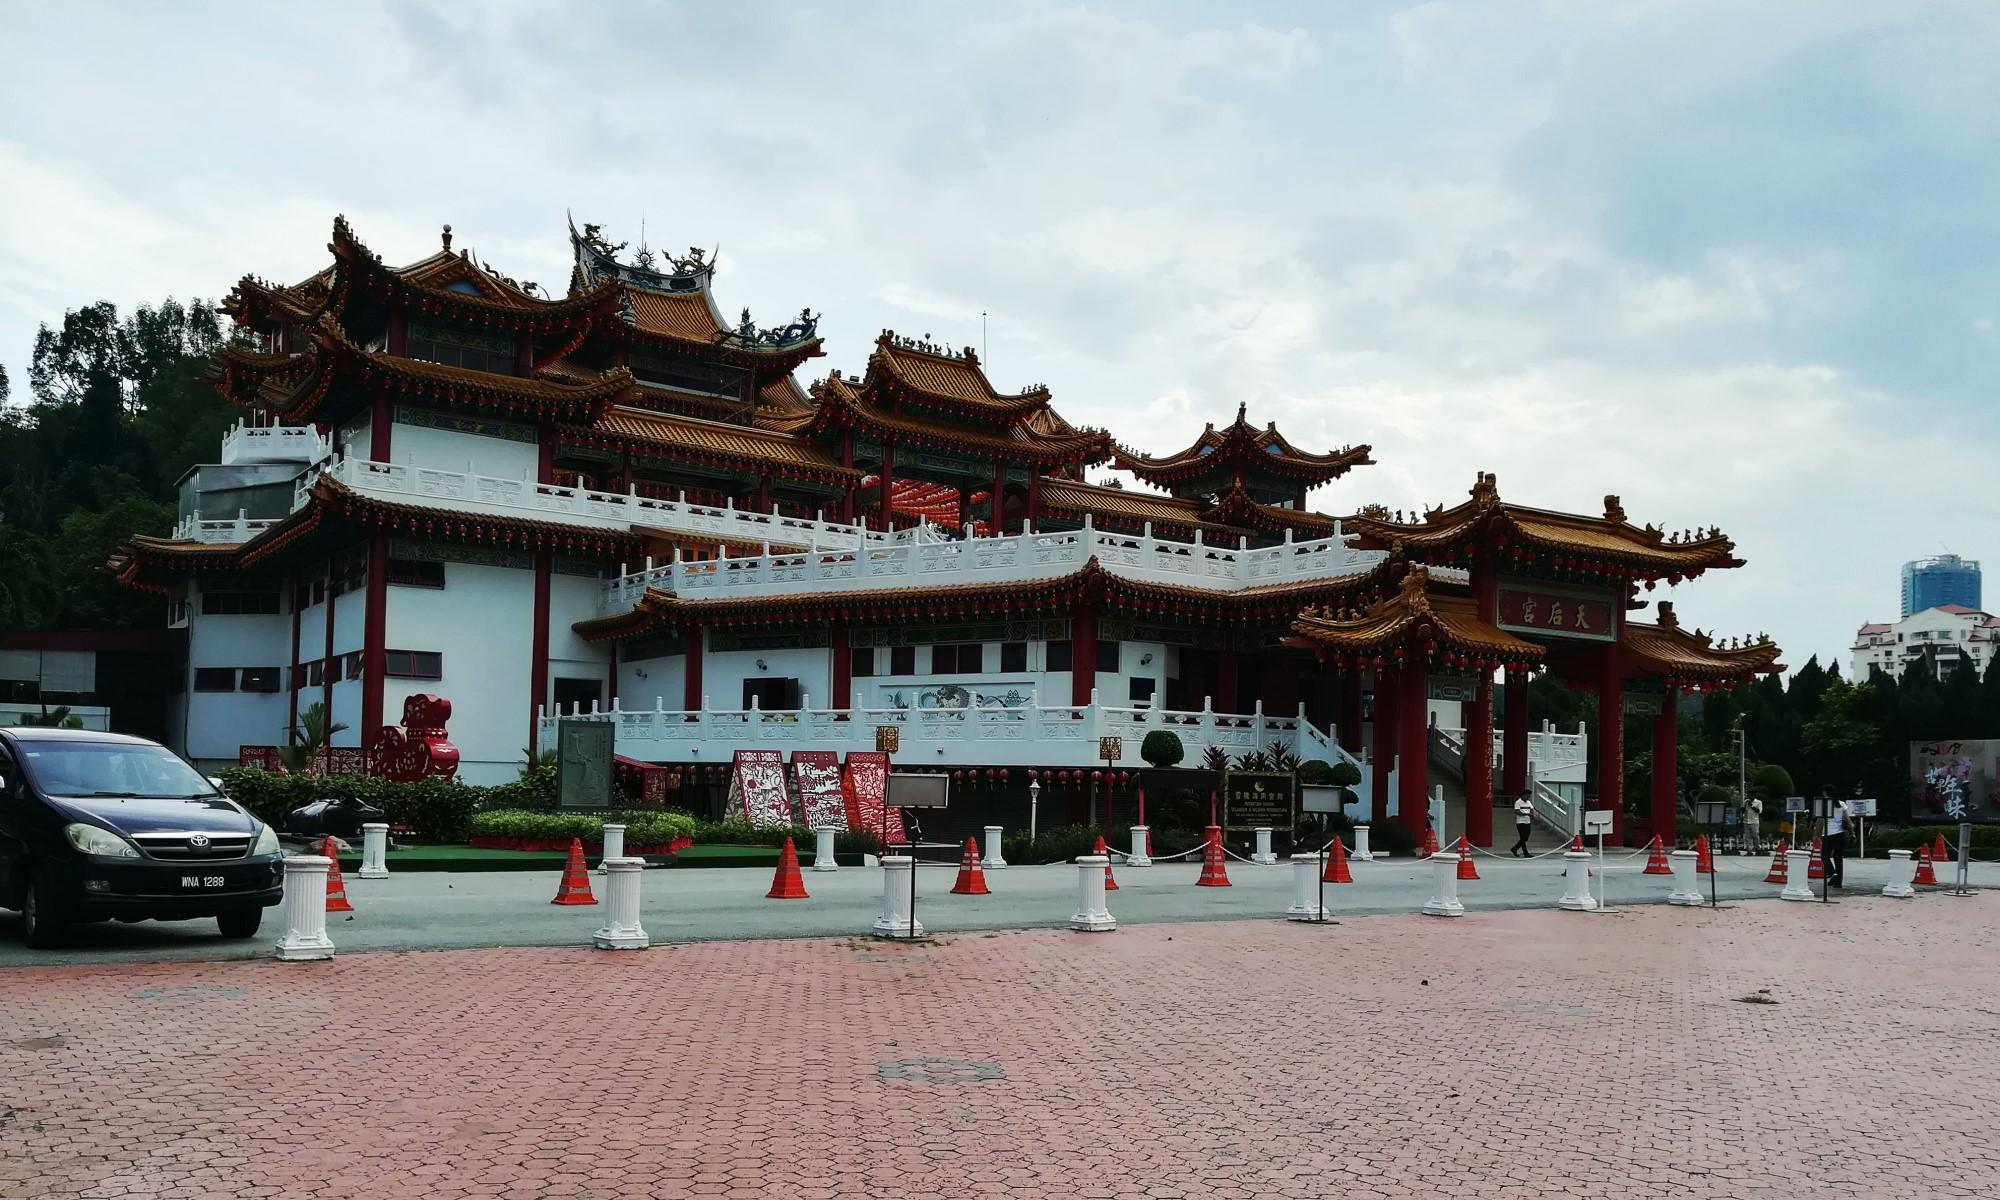 Китайский храм Тянь Ху | Русский гид в Куала-Лумпуре